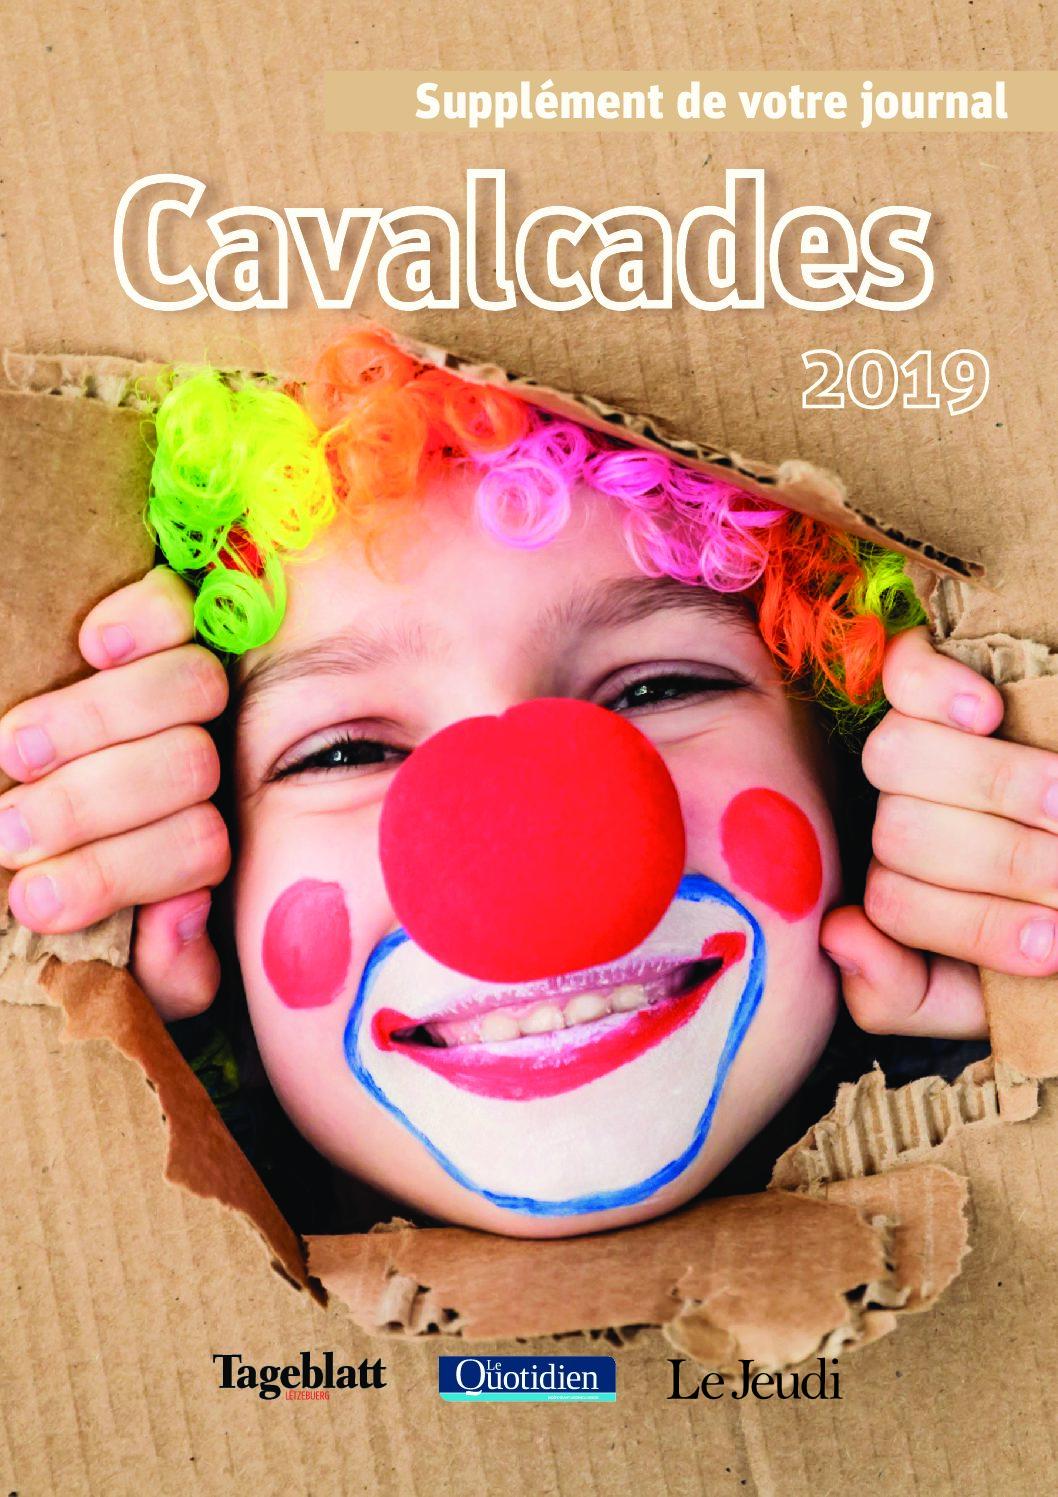 Supplément Cavalcade – TAGEBLATT & LE QUOTIDIEN